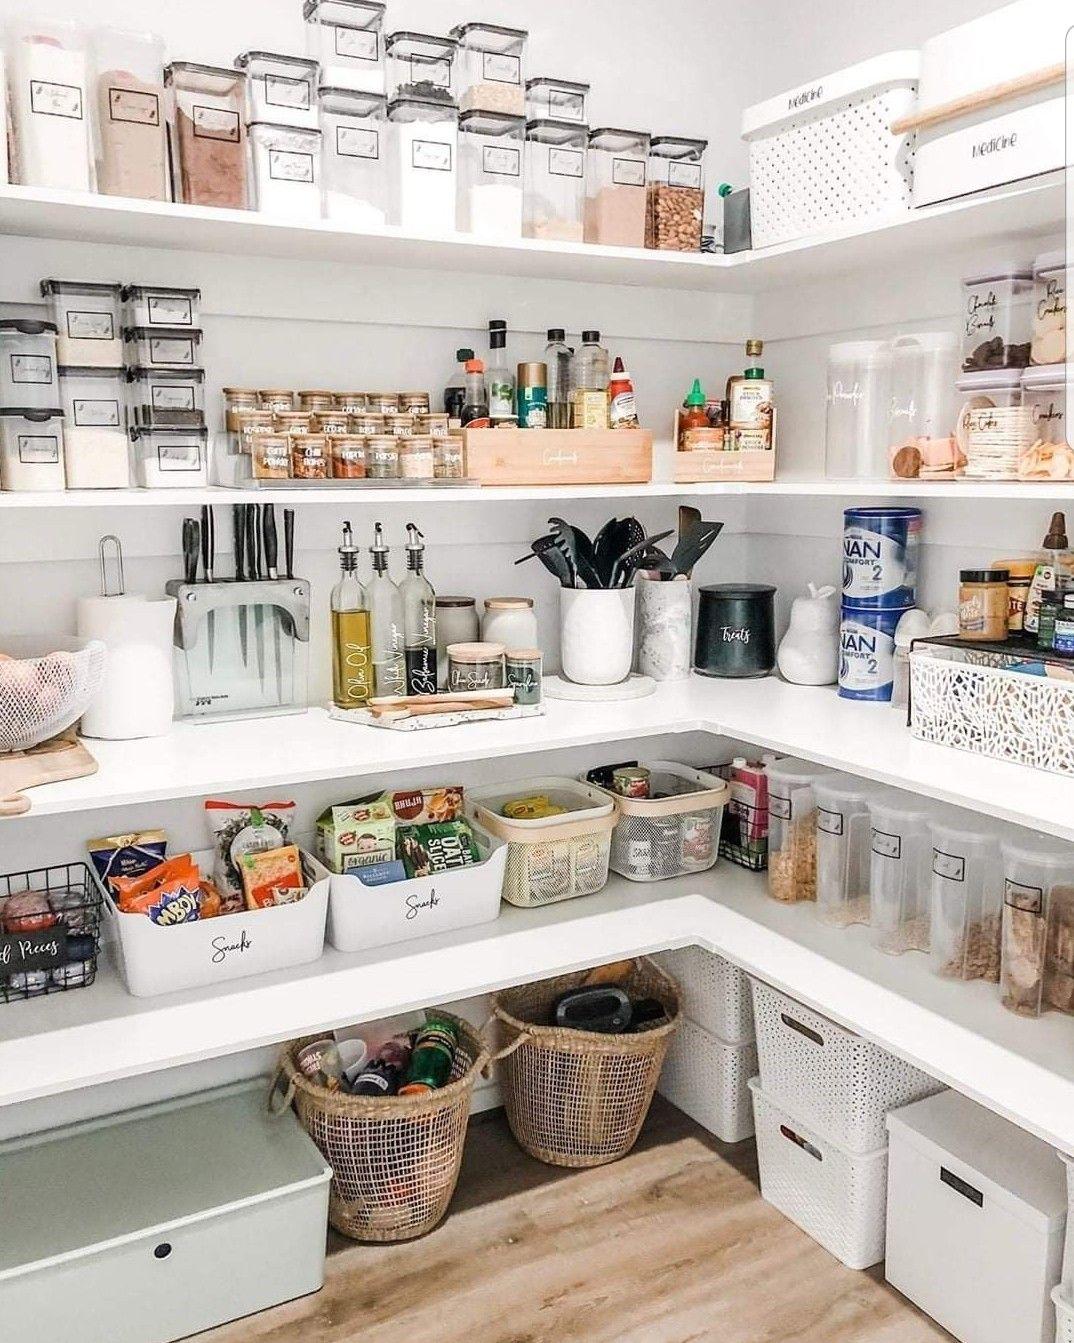 Epingle Par Amina Tazi Sur Farmhouse Kitchen Rangement Garde Manger Idee Rangement Cuisine Idee Deco Buanderie